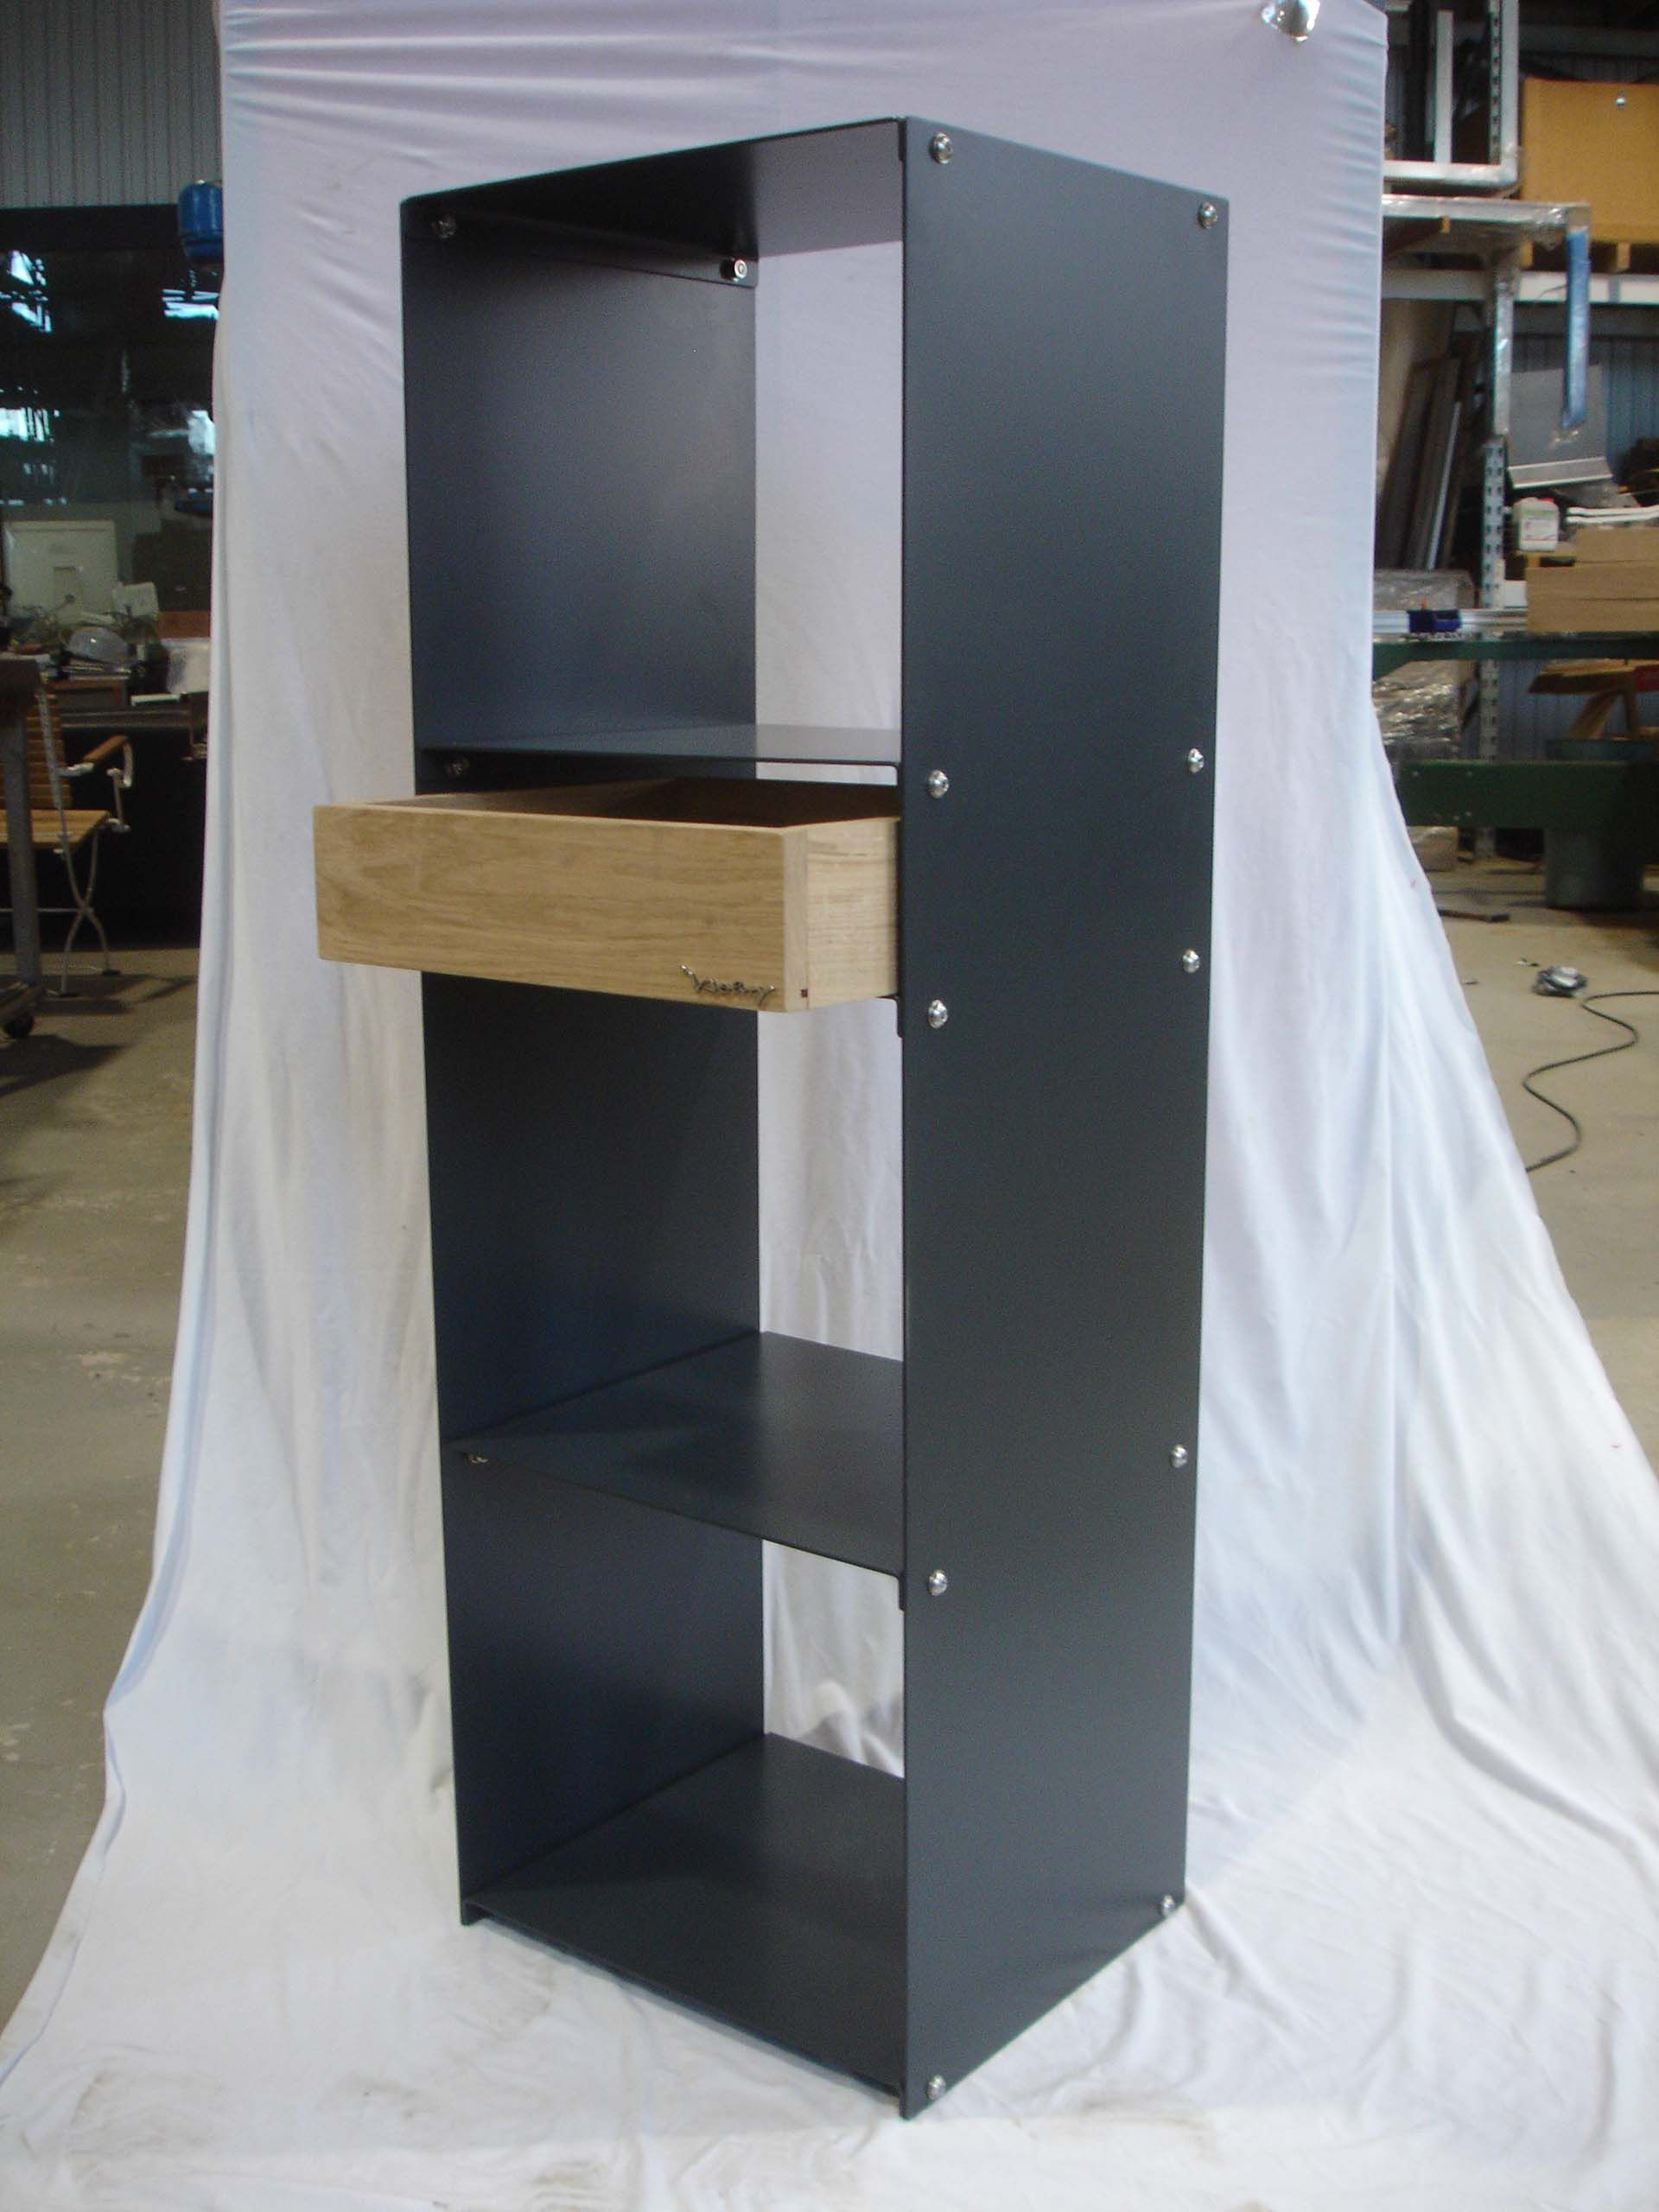 design metallmoebel kaminholzregal kaminholzaufbewahrung brennholzaufbewahrung aus stahl. Black Bedroom Furniture Sets. Home Design Ideas